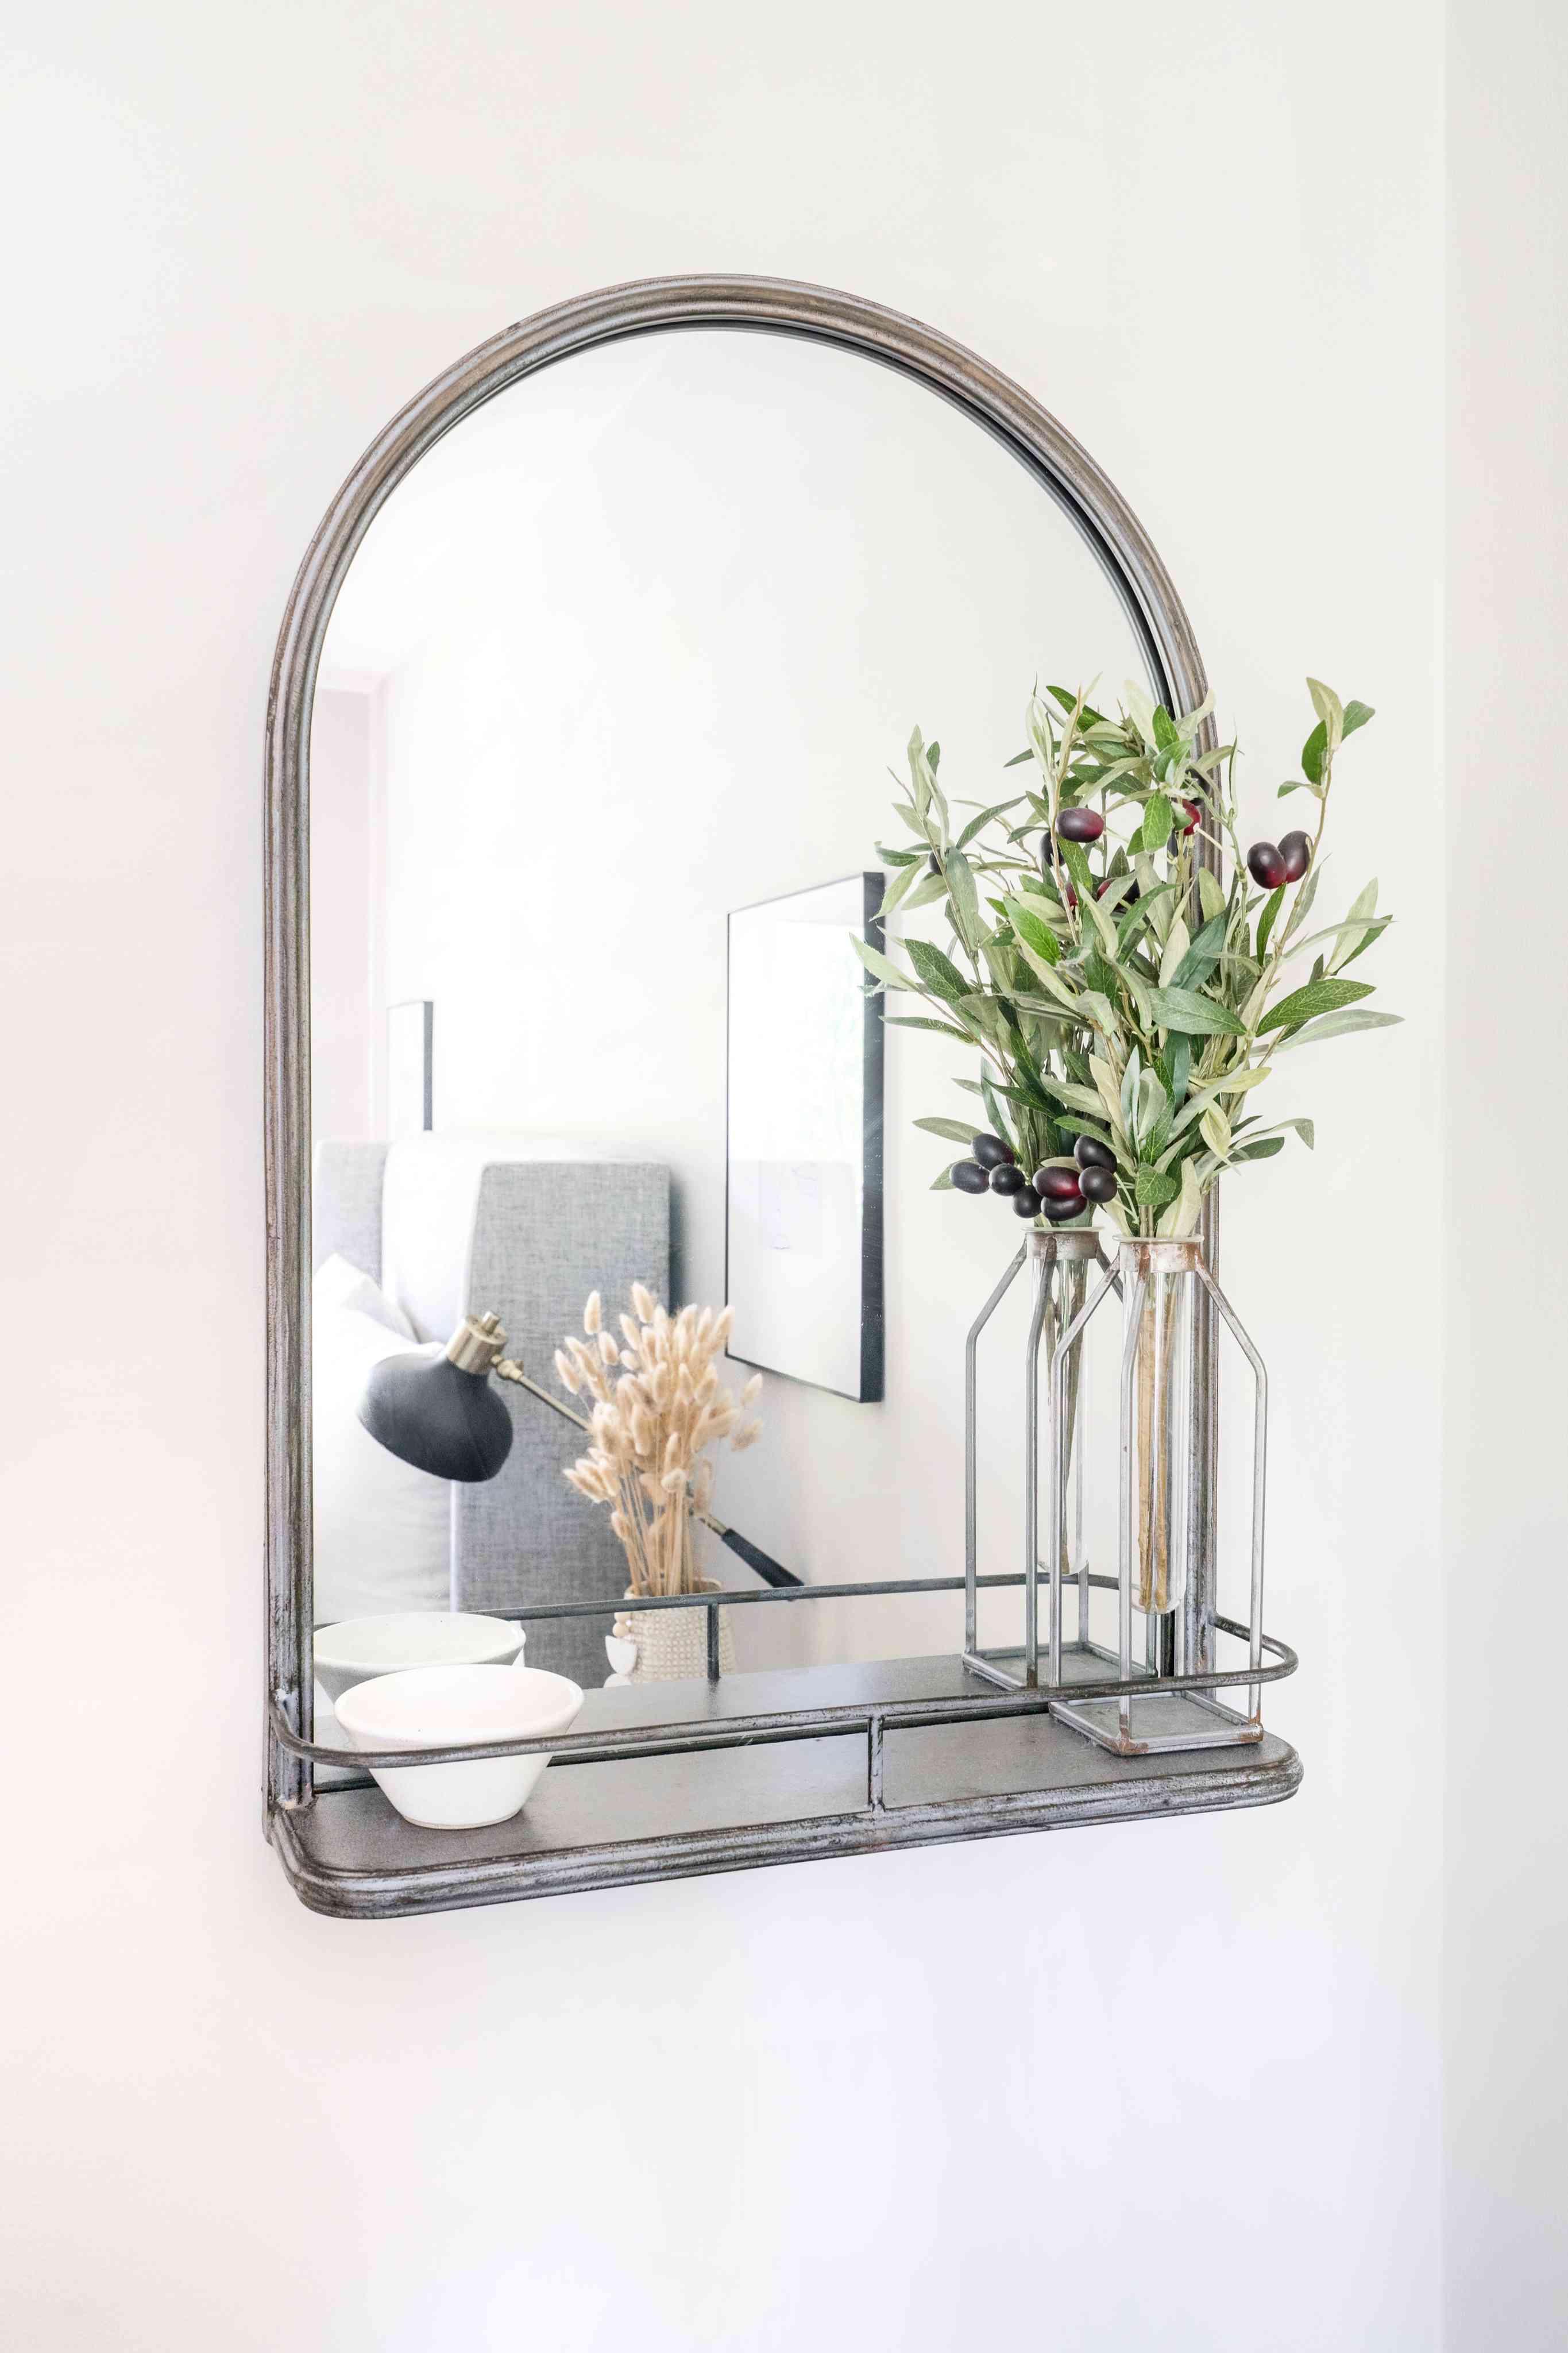 alisha agrellas home tour - bedroom mirror with storage